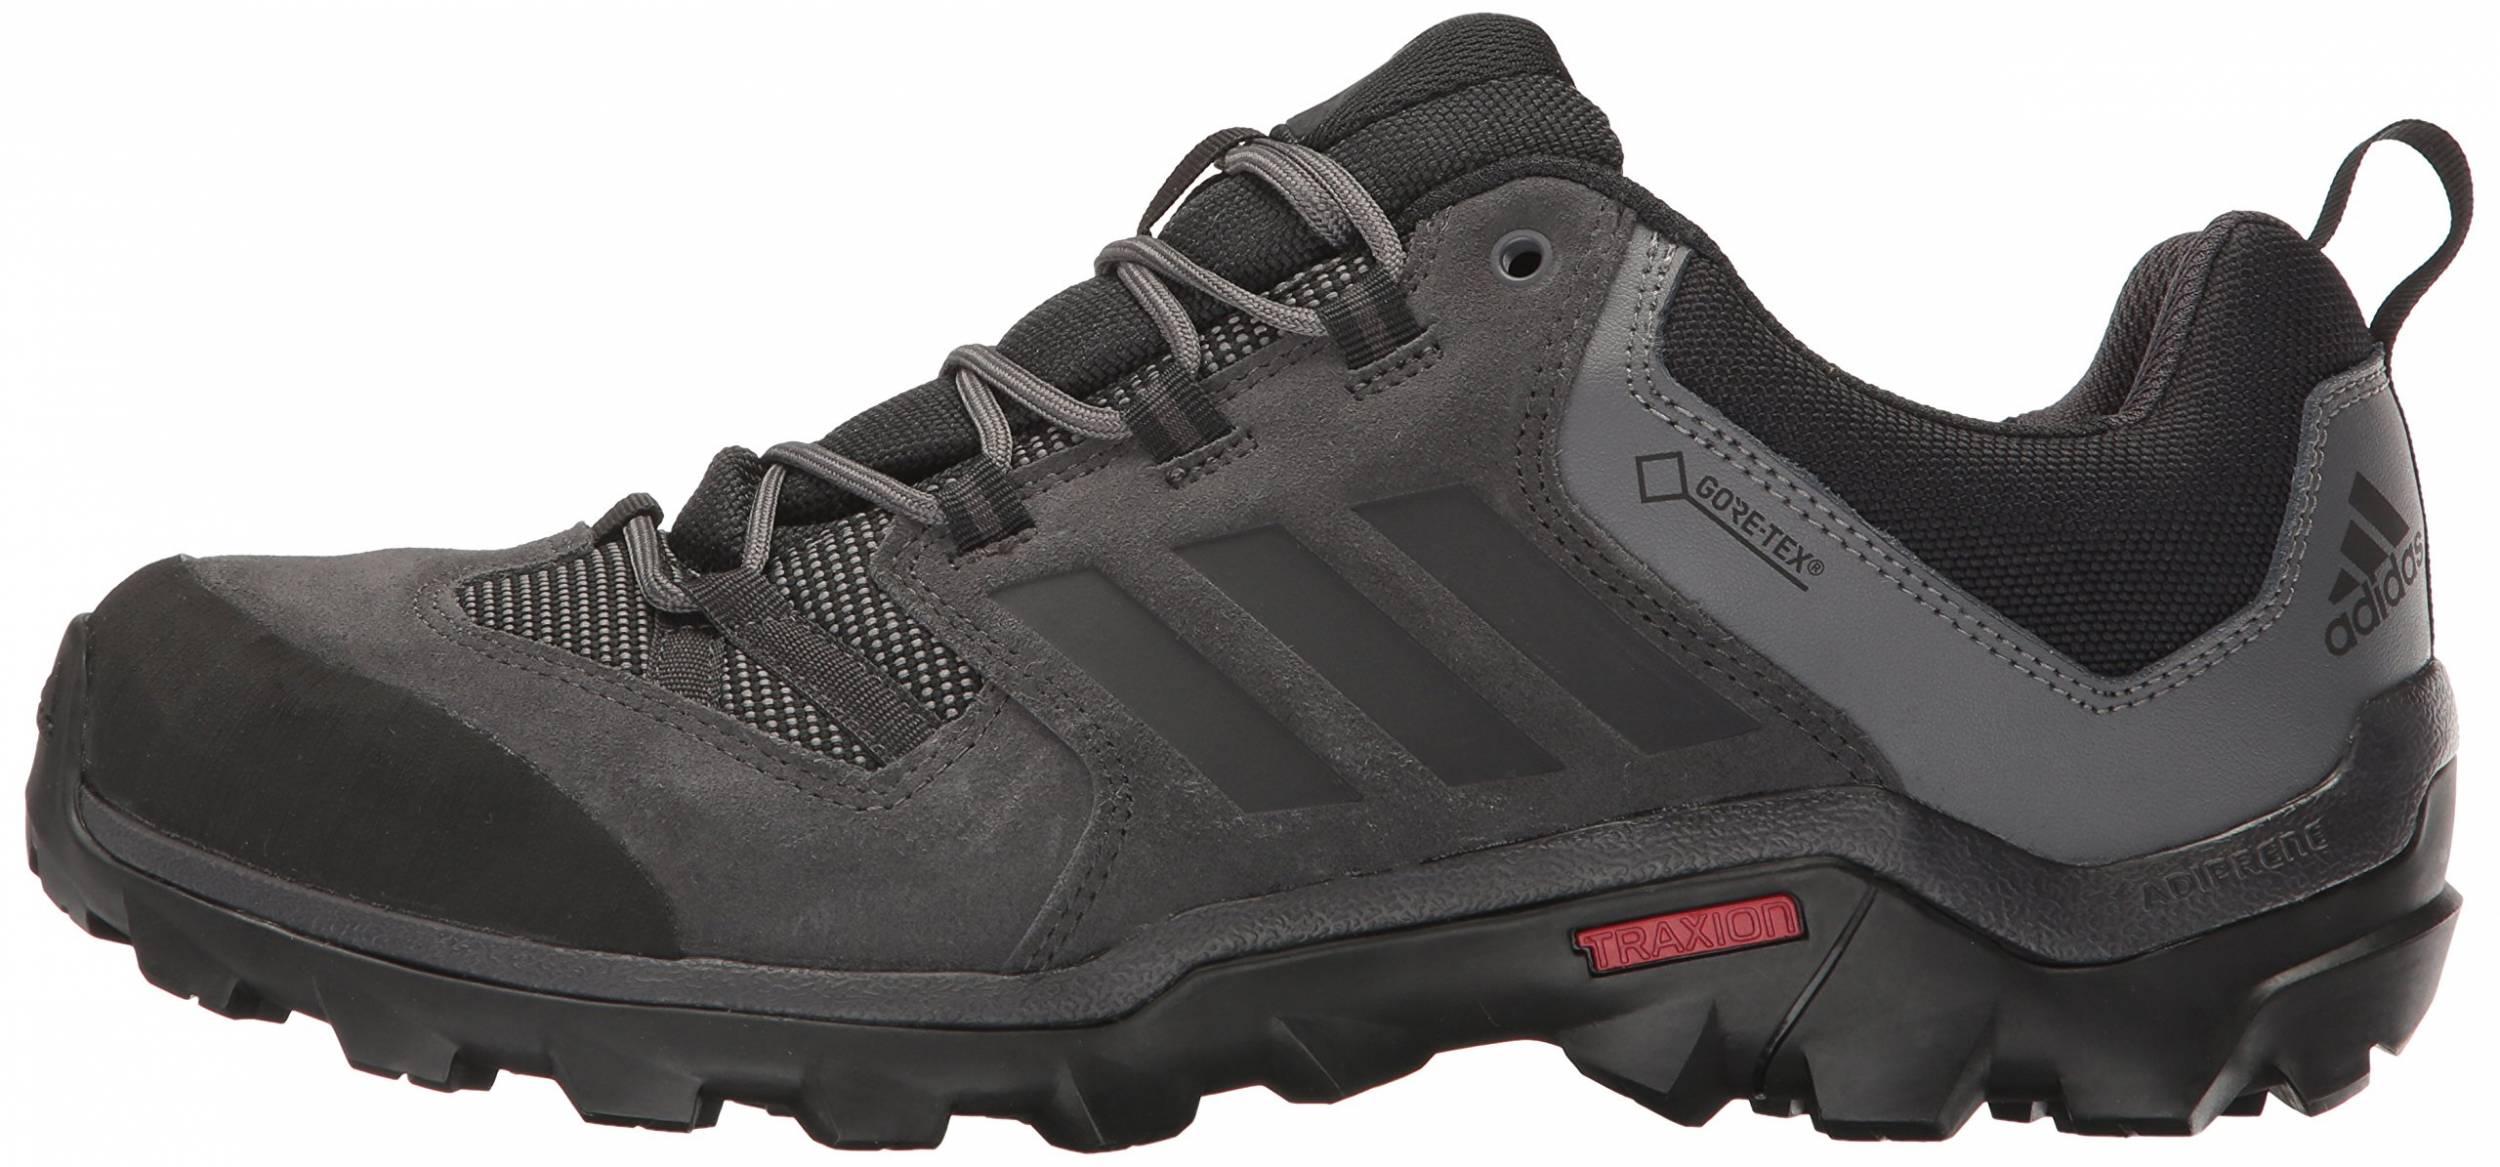 Adidas Gore-Tex Hiking Shoes